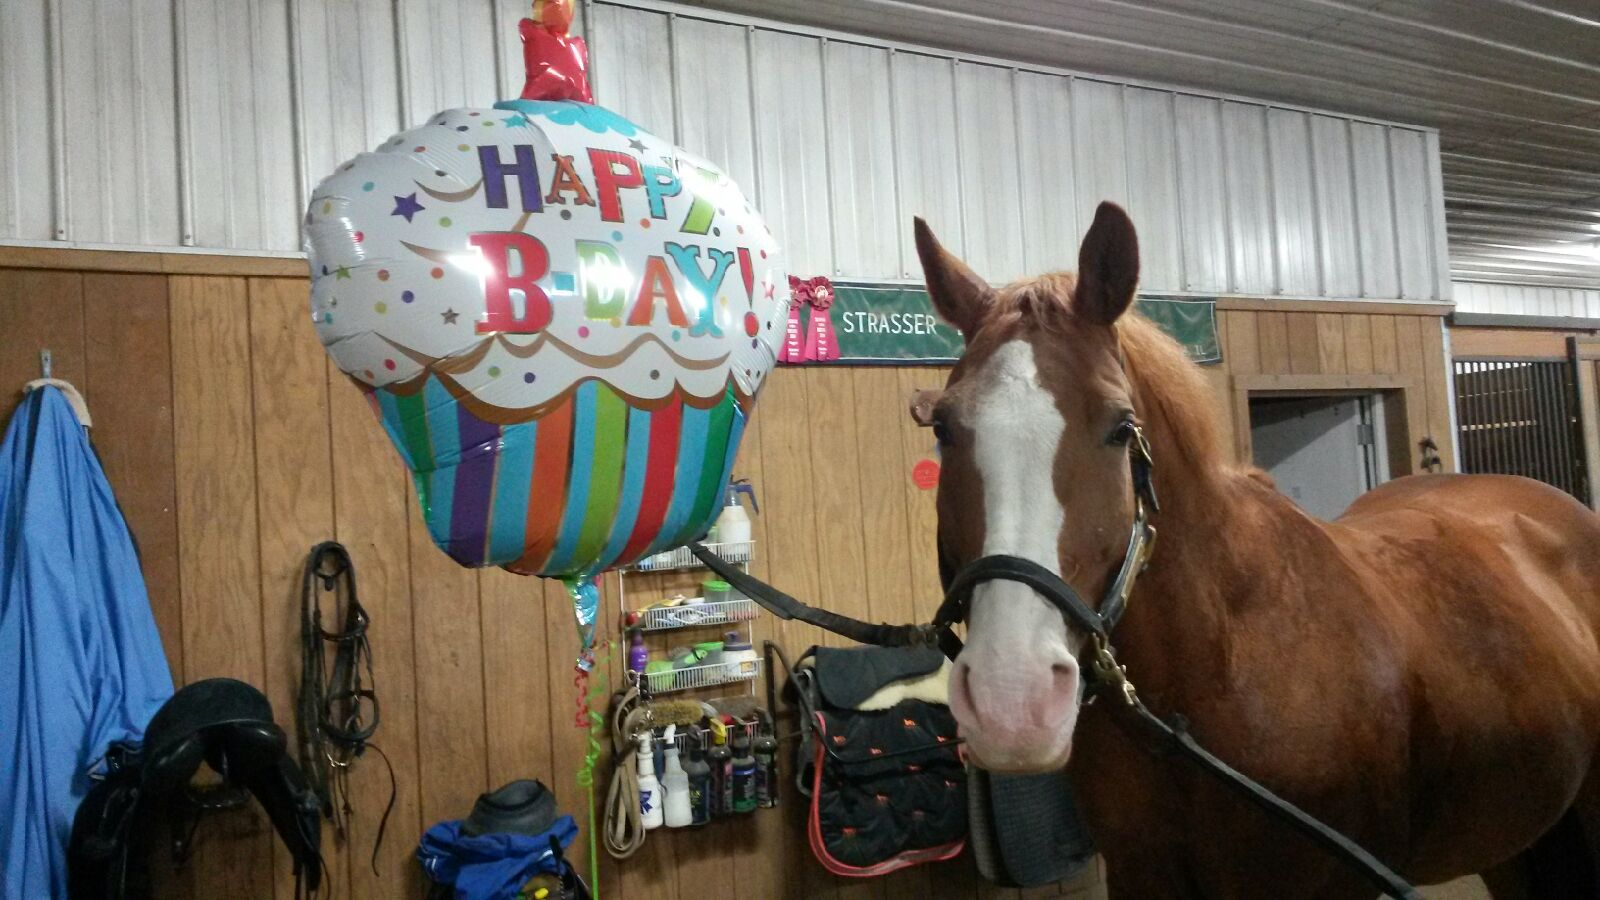 Ripple and his Birthday Balloon